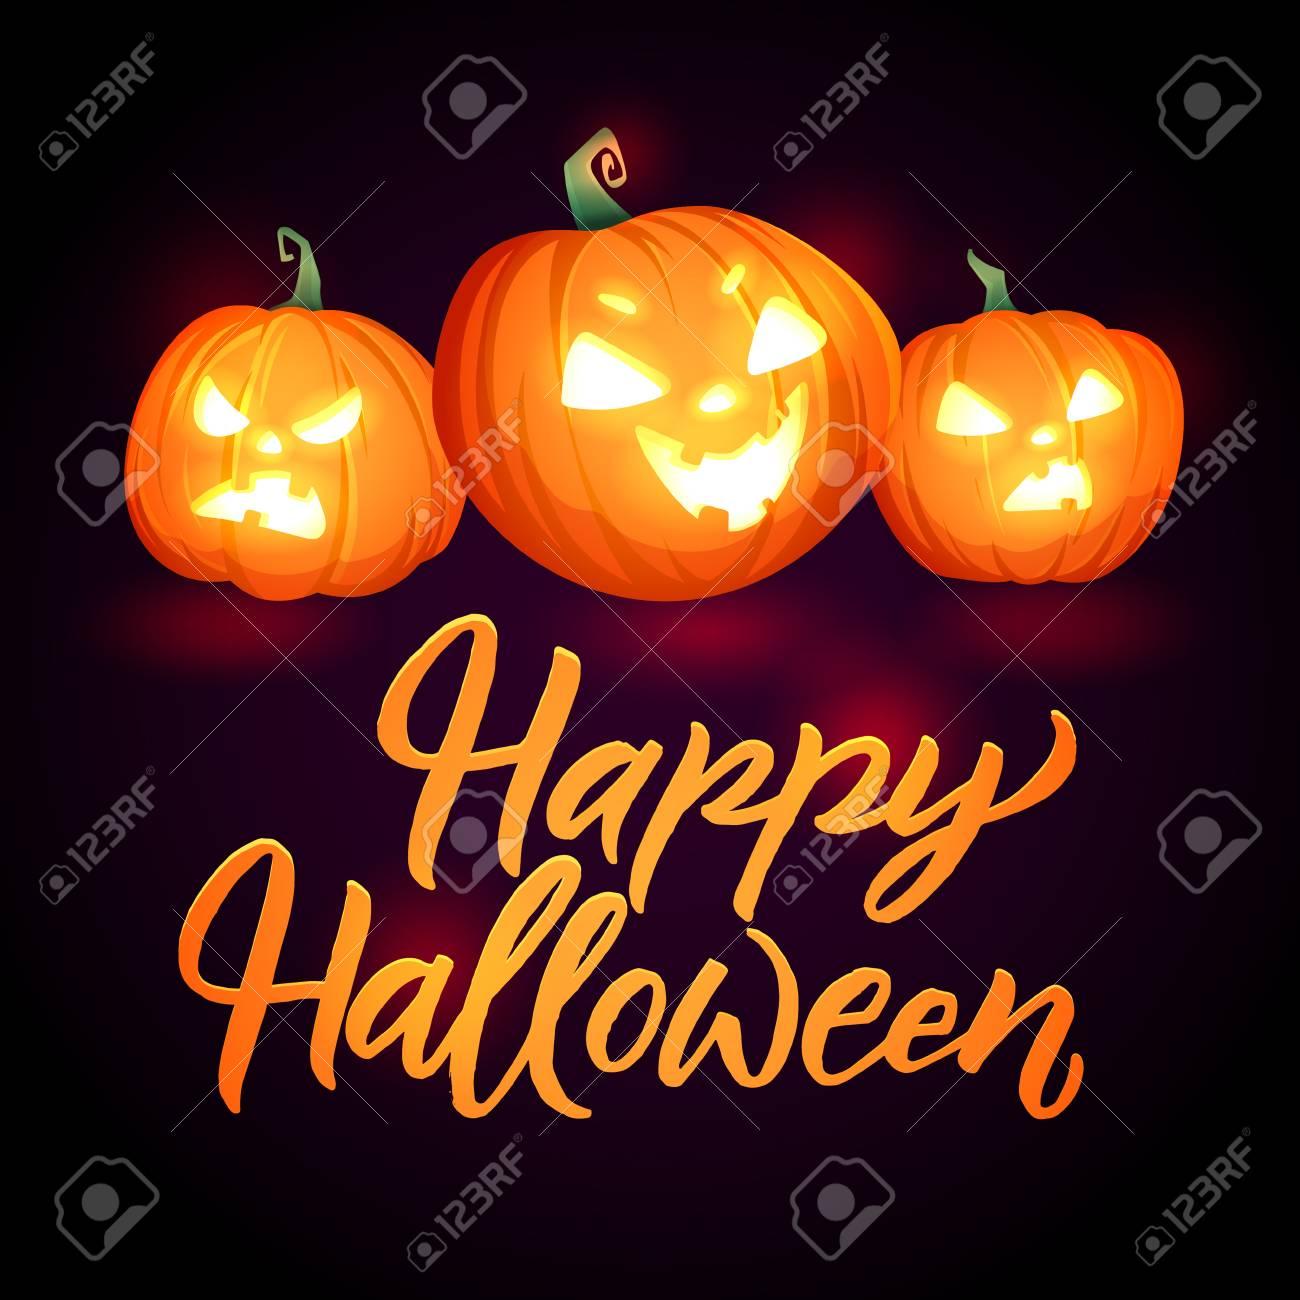 Halloween Pumpkins Vector Poster Glowing Pumpkins Greeting Royalty Free Cliparts Vectors And Stock Illustration Image 88316778